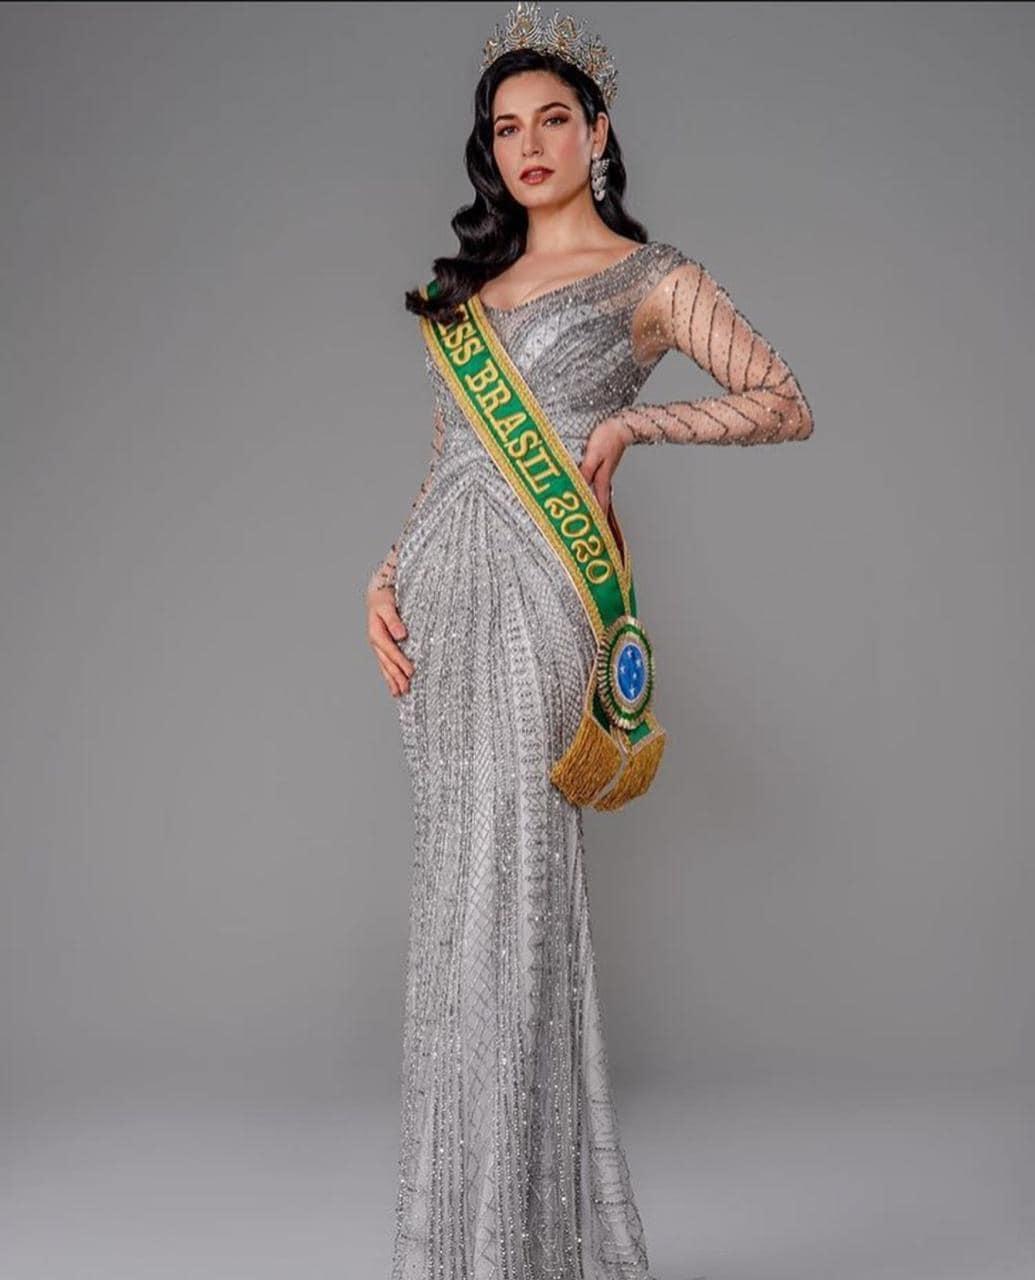 julia gama, miss brasil universo 2020/top 11 de miss world 2014. part I. - Página 4 11834110